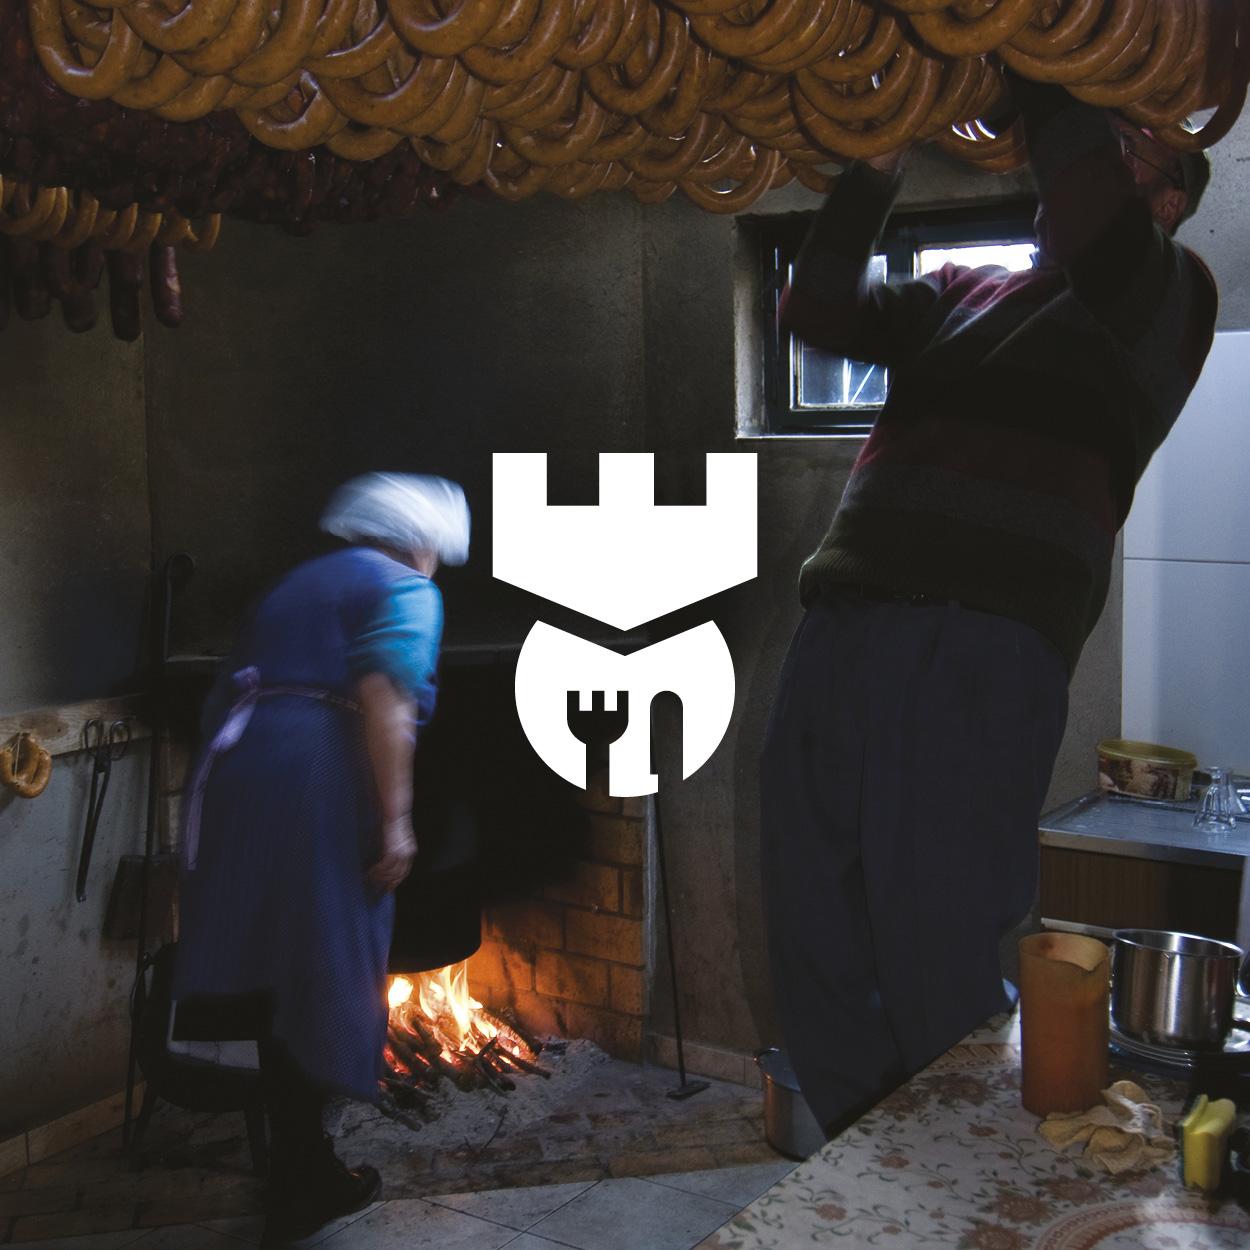 rui-carvalho-design-camara-municipal-de-braganca-identidade-gastronomia-enchidos-3